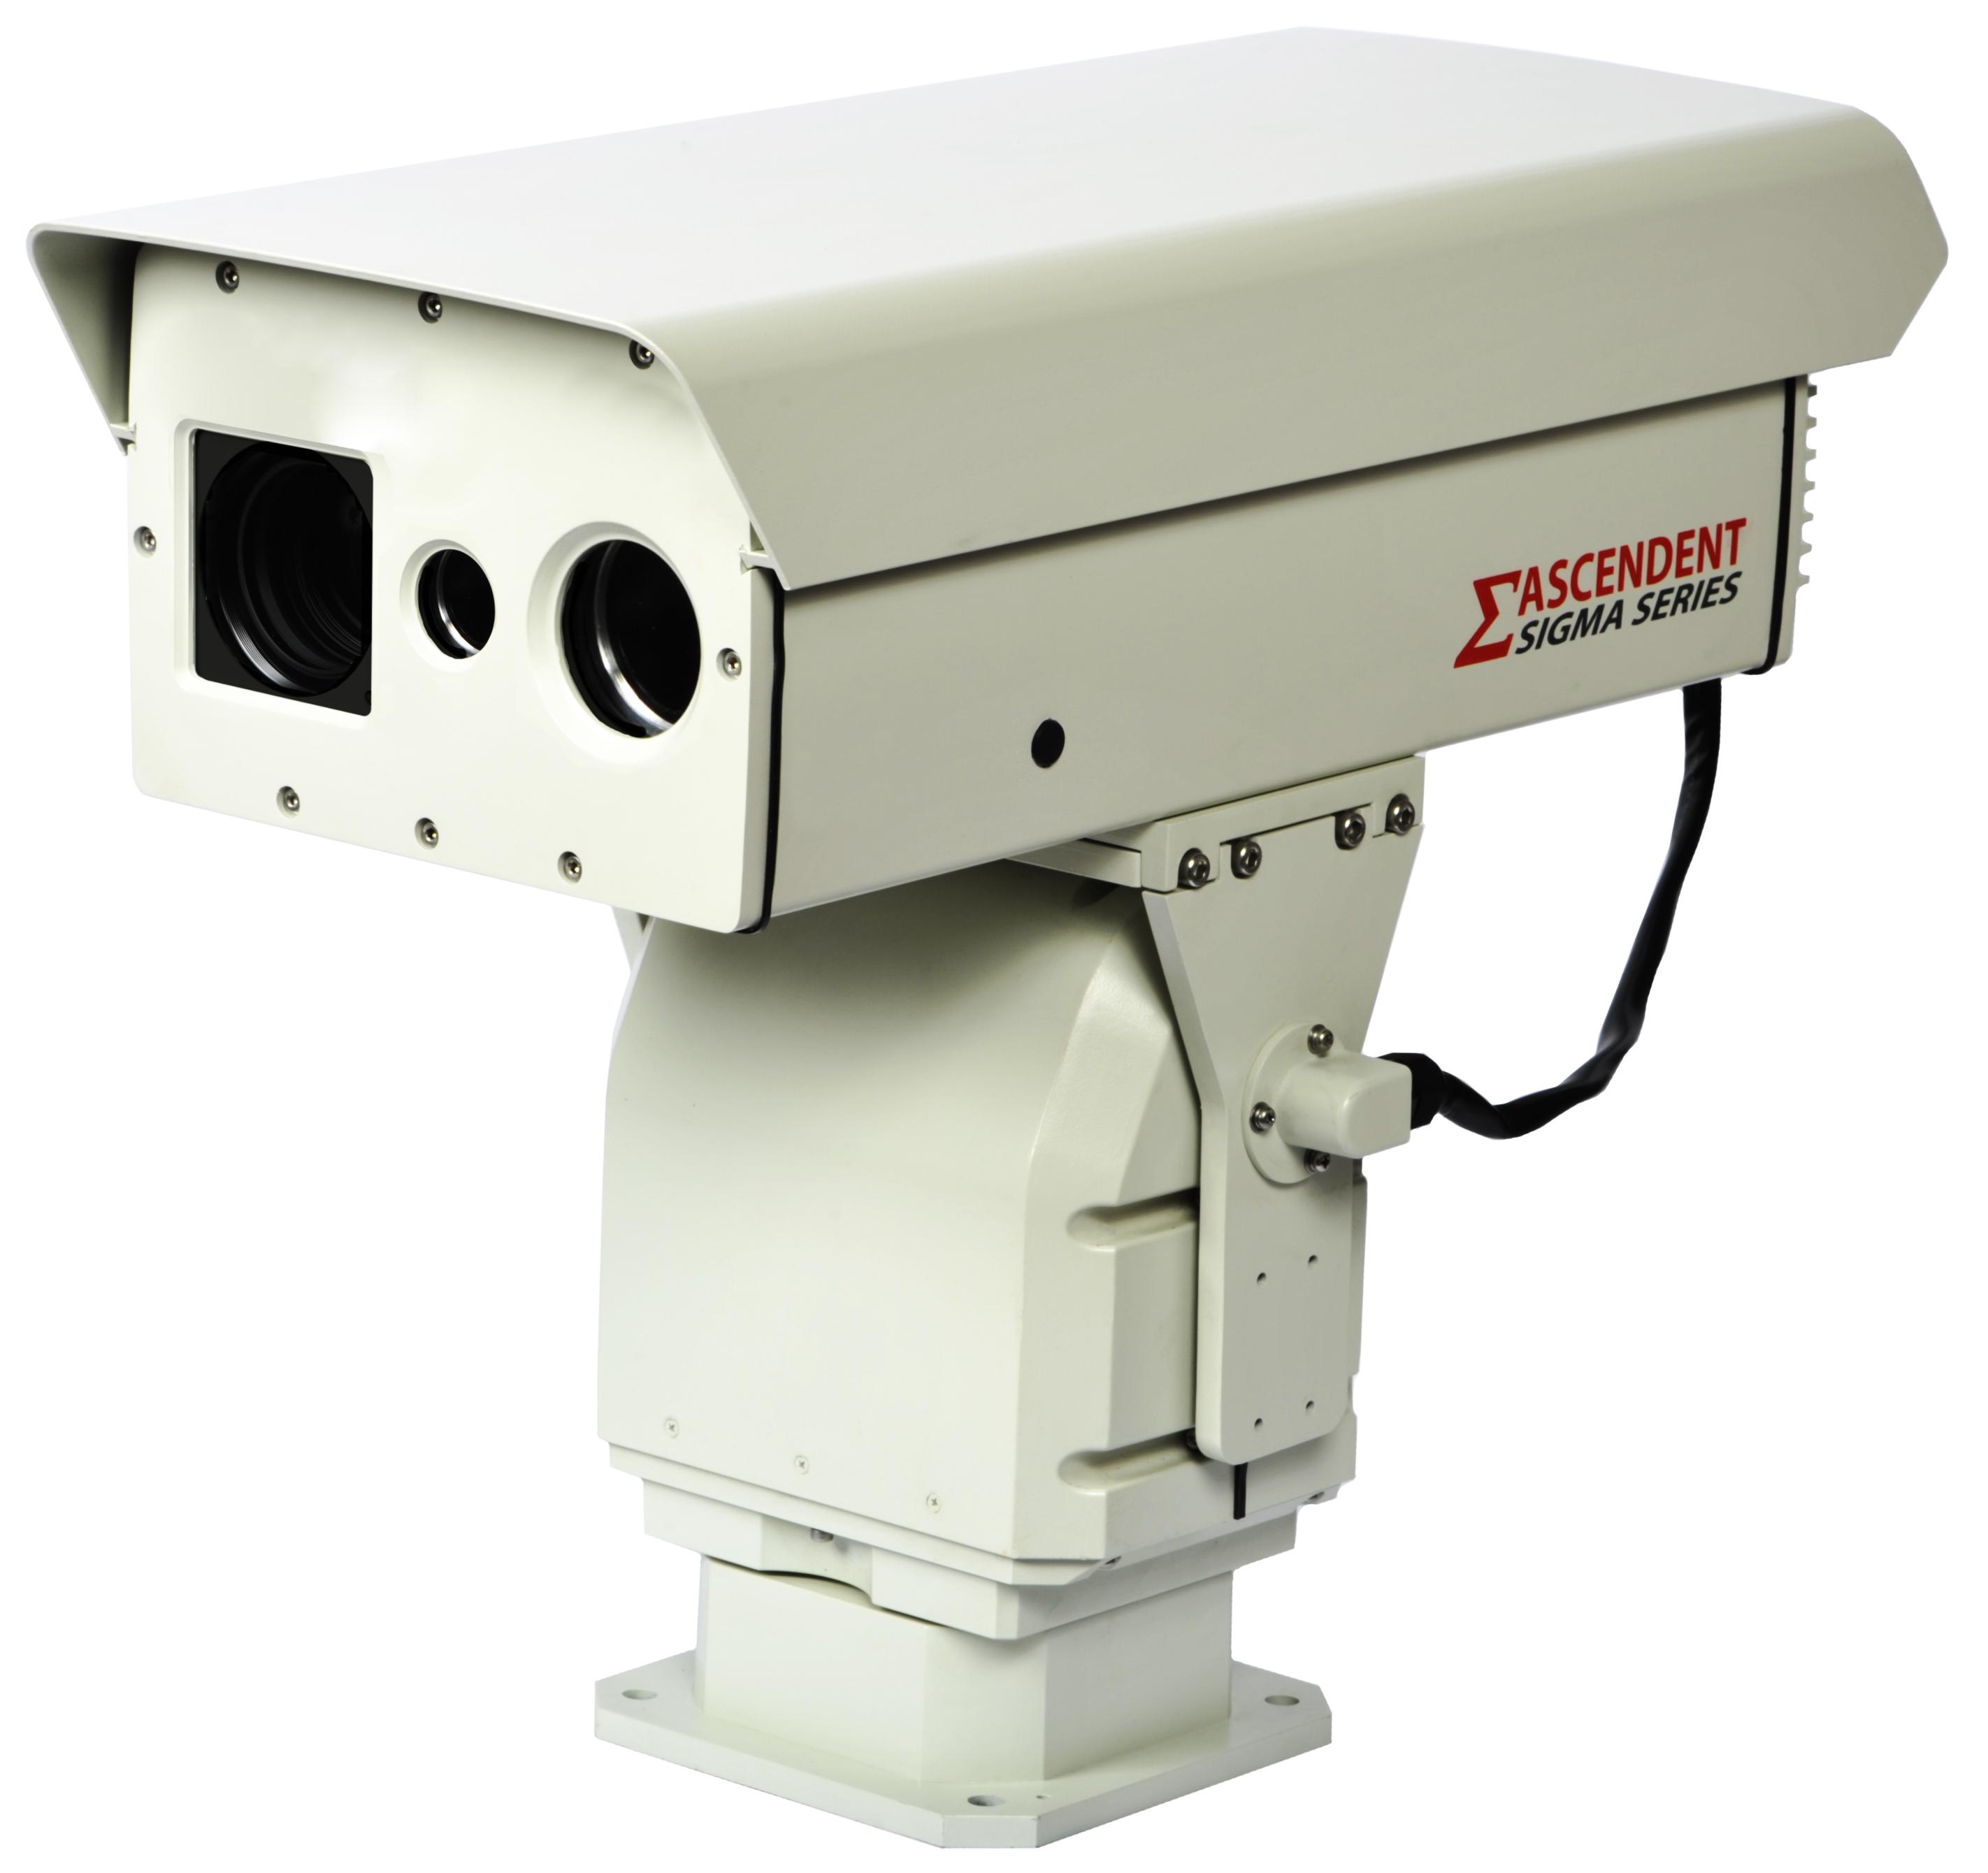 Ascendent Ultra Long Range Electro Optical Camera Zlid